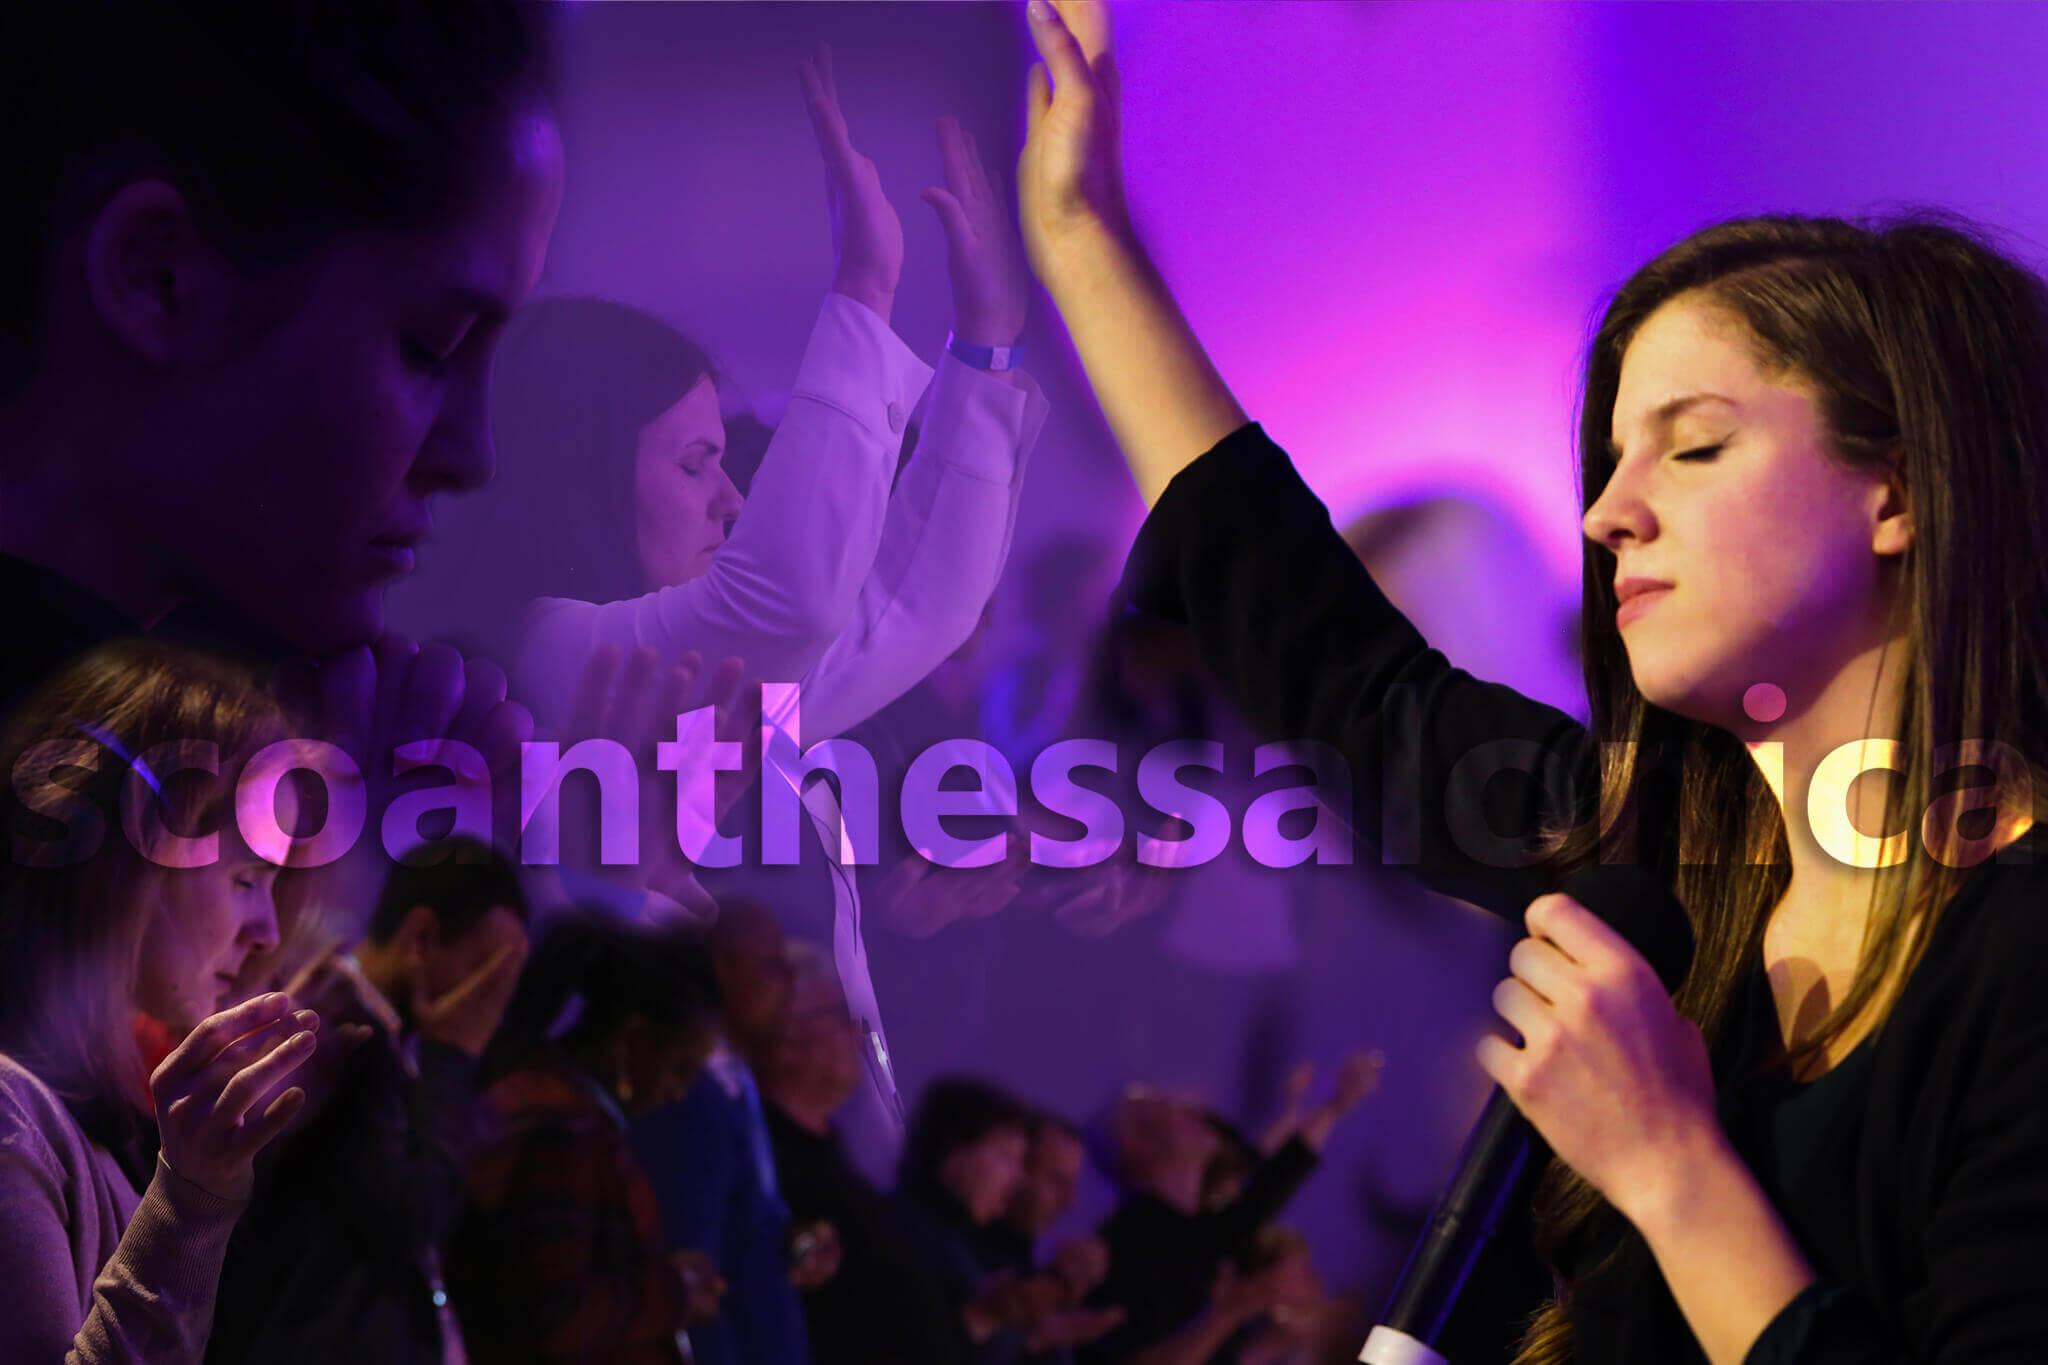 SCOAN_THESSALONICA_WORSHIP_2020_03_15